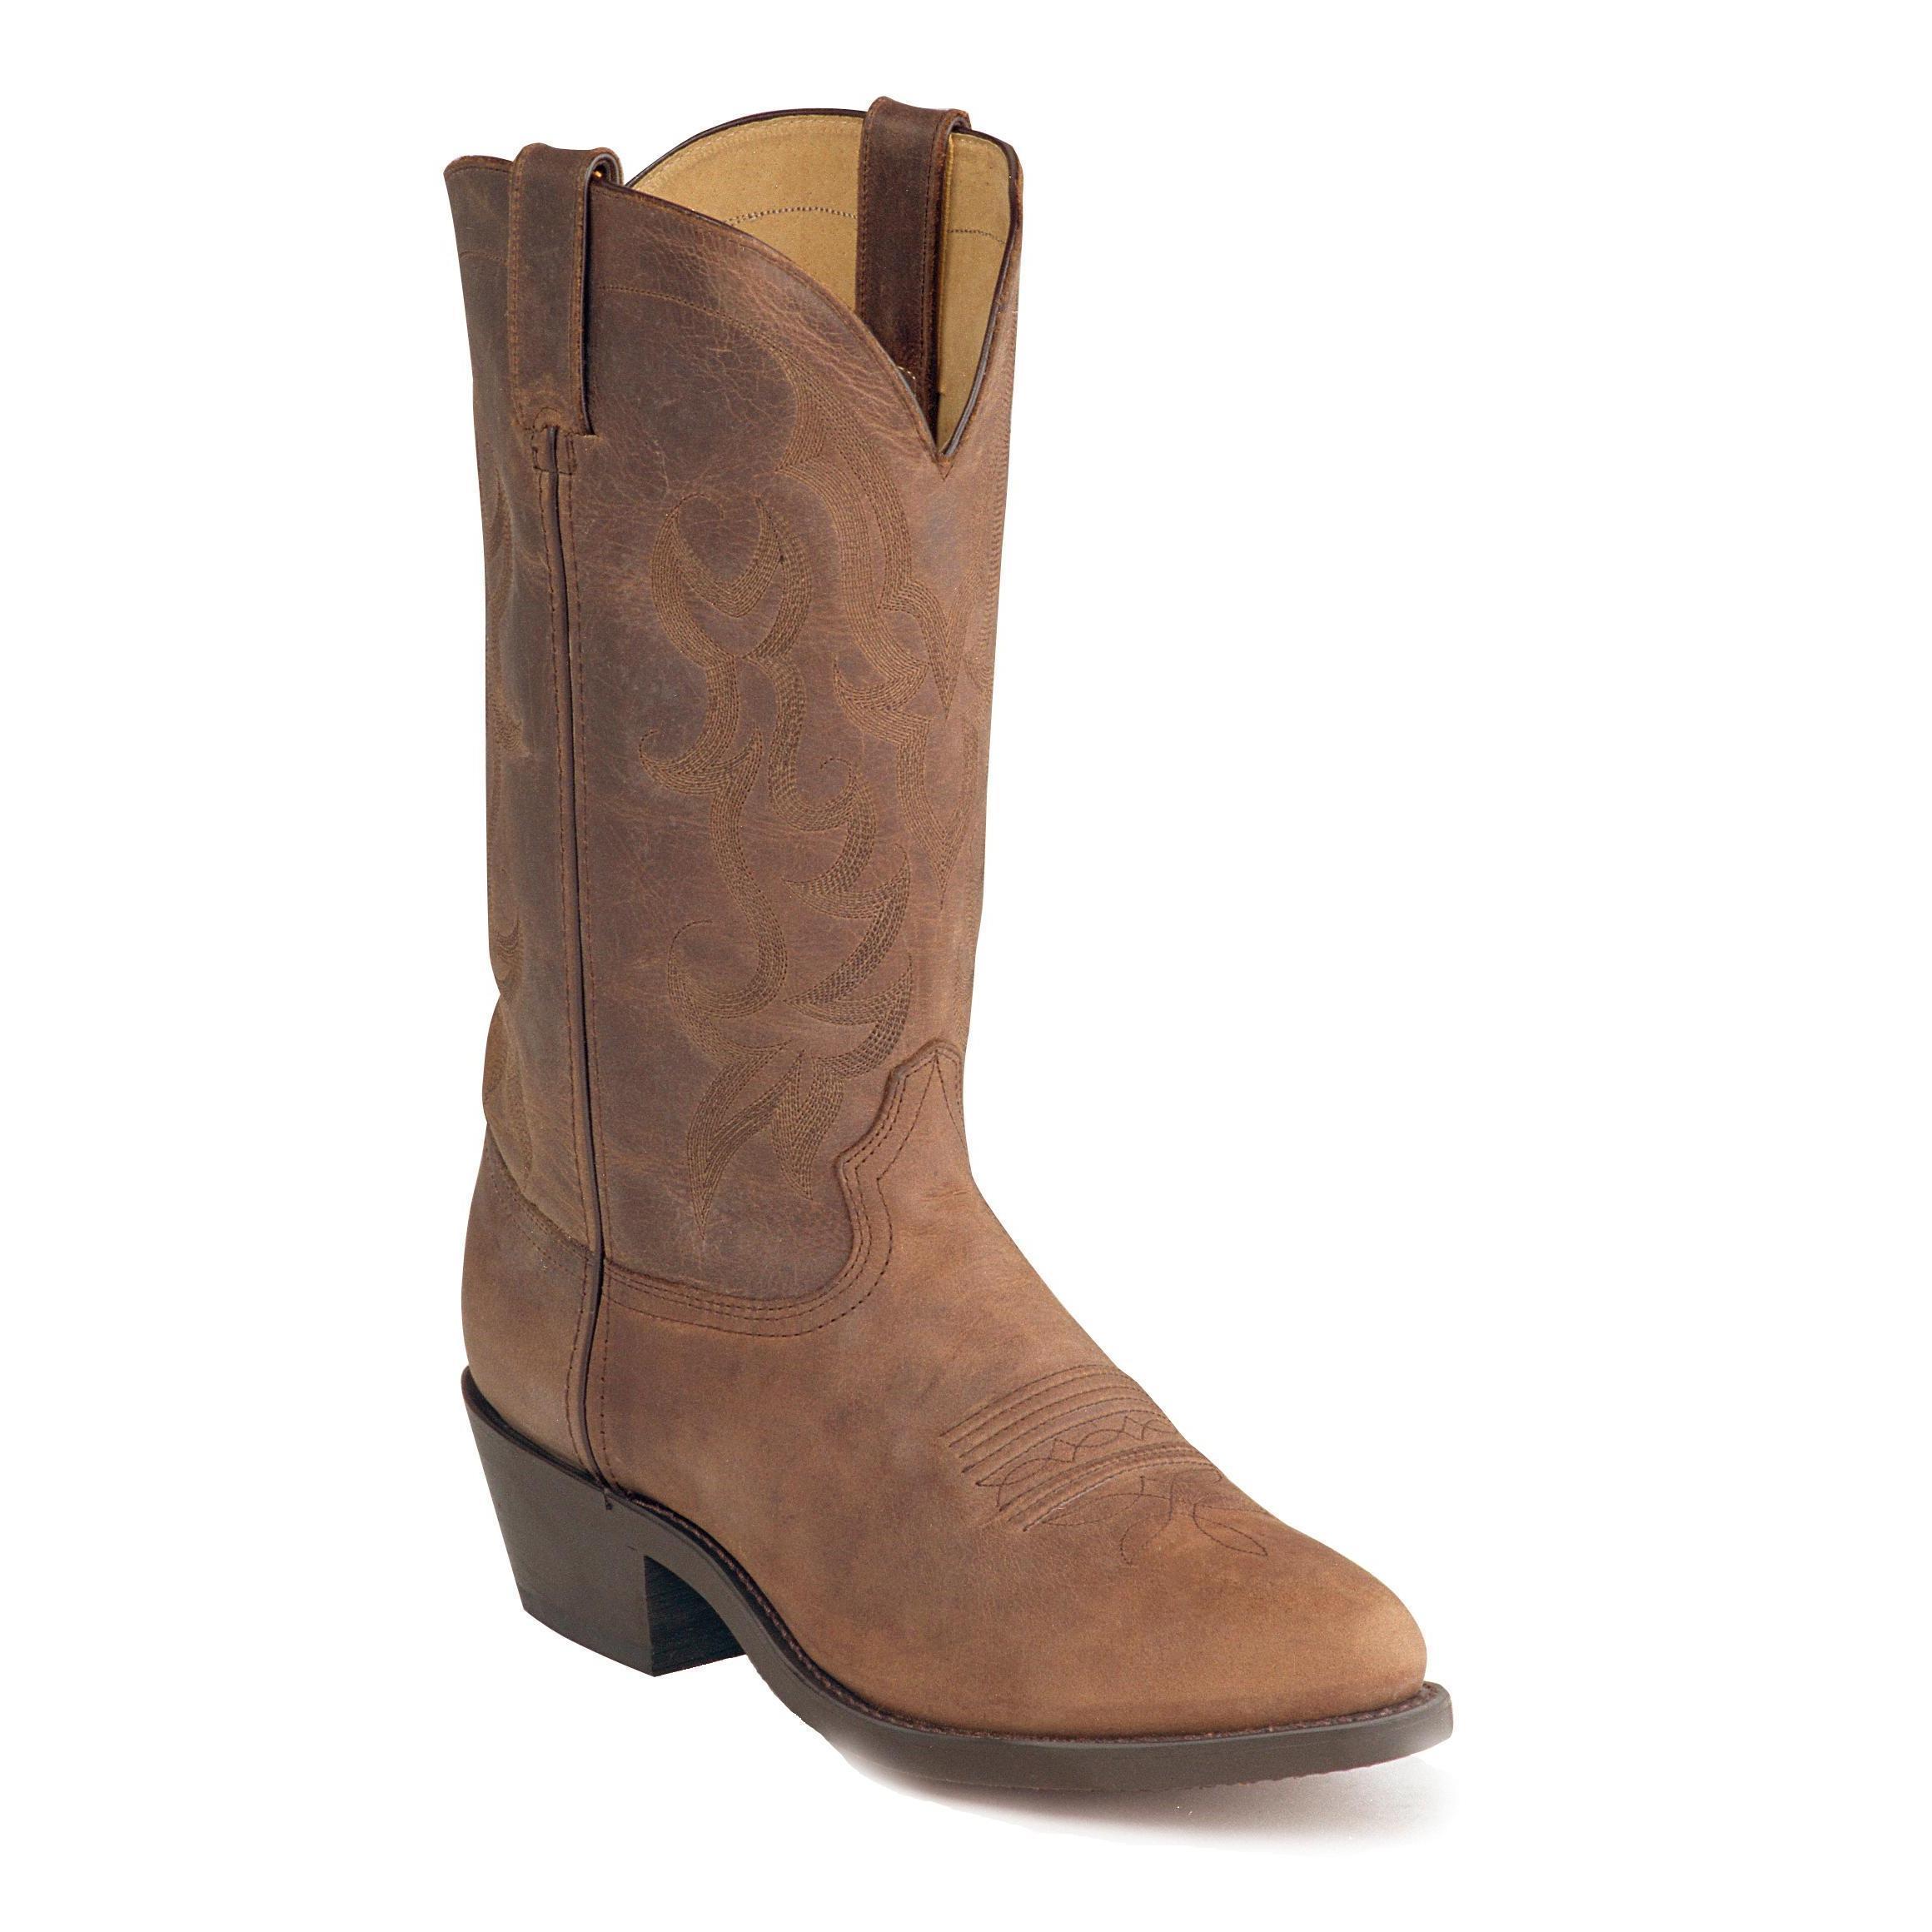 db00d3fdd11 Durango Soft Tan Leather Western Boot